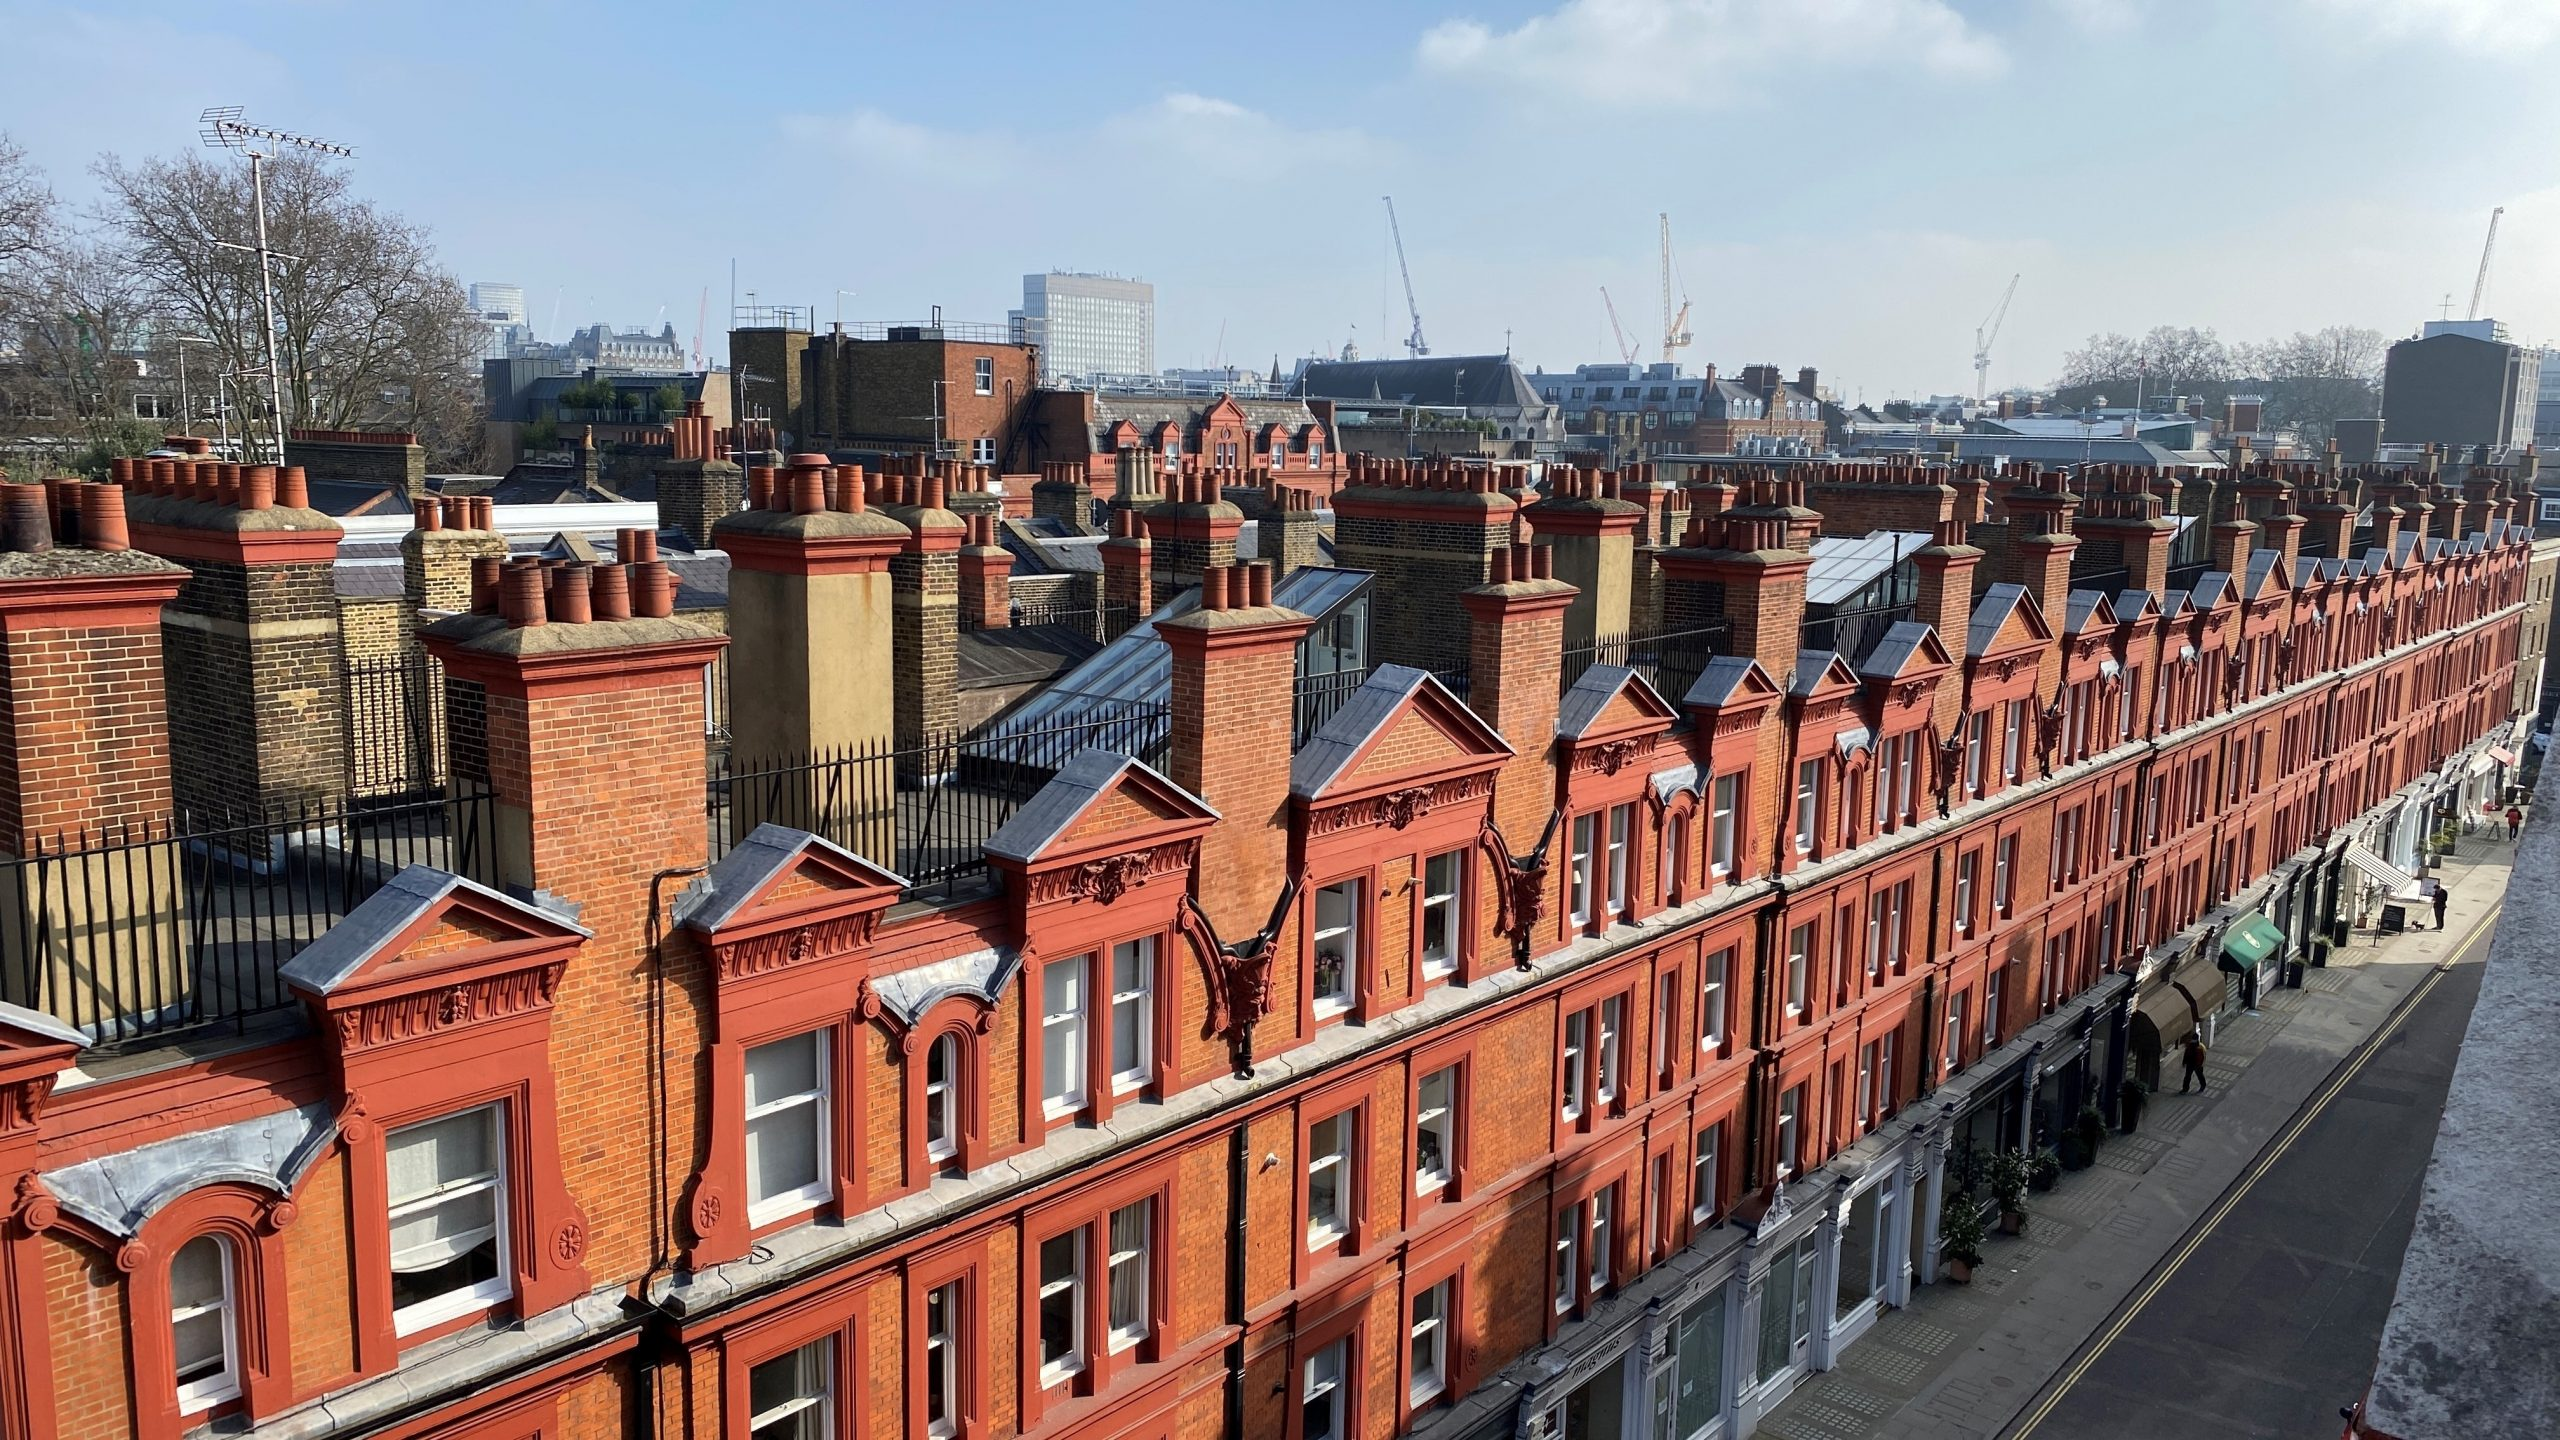 Wendover Rooftop Glazed Enclosures